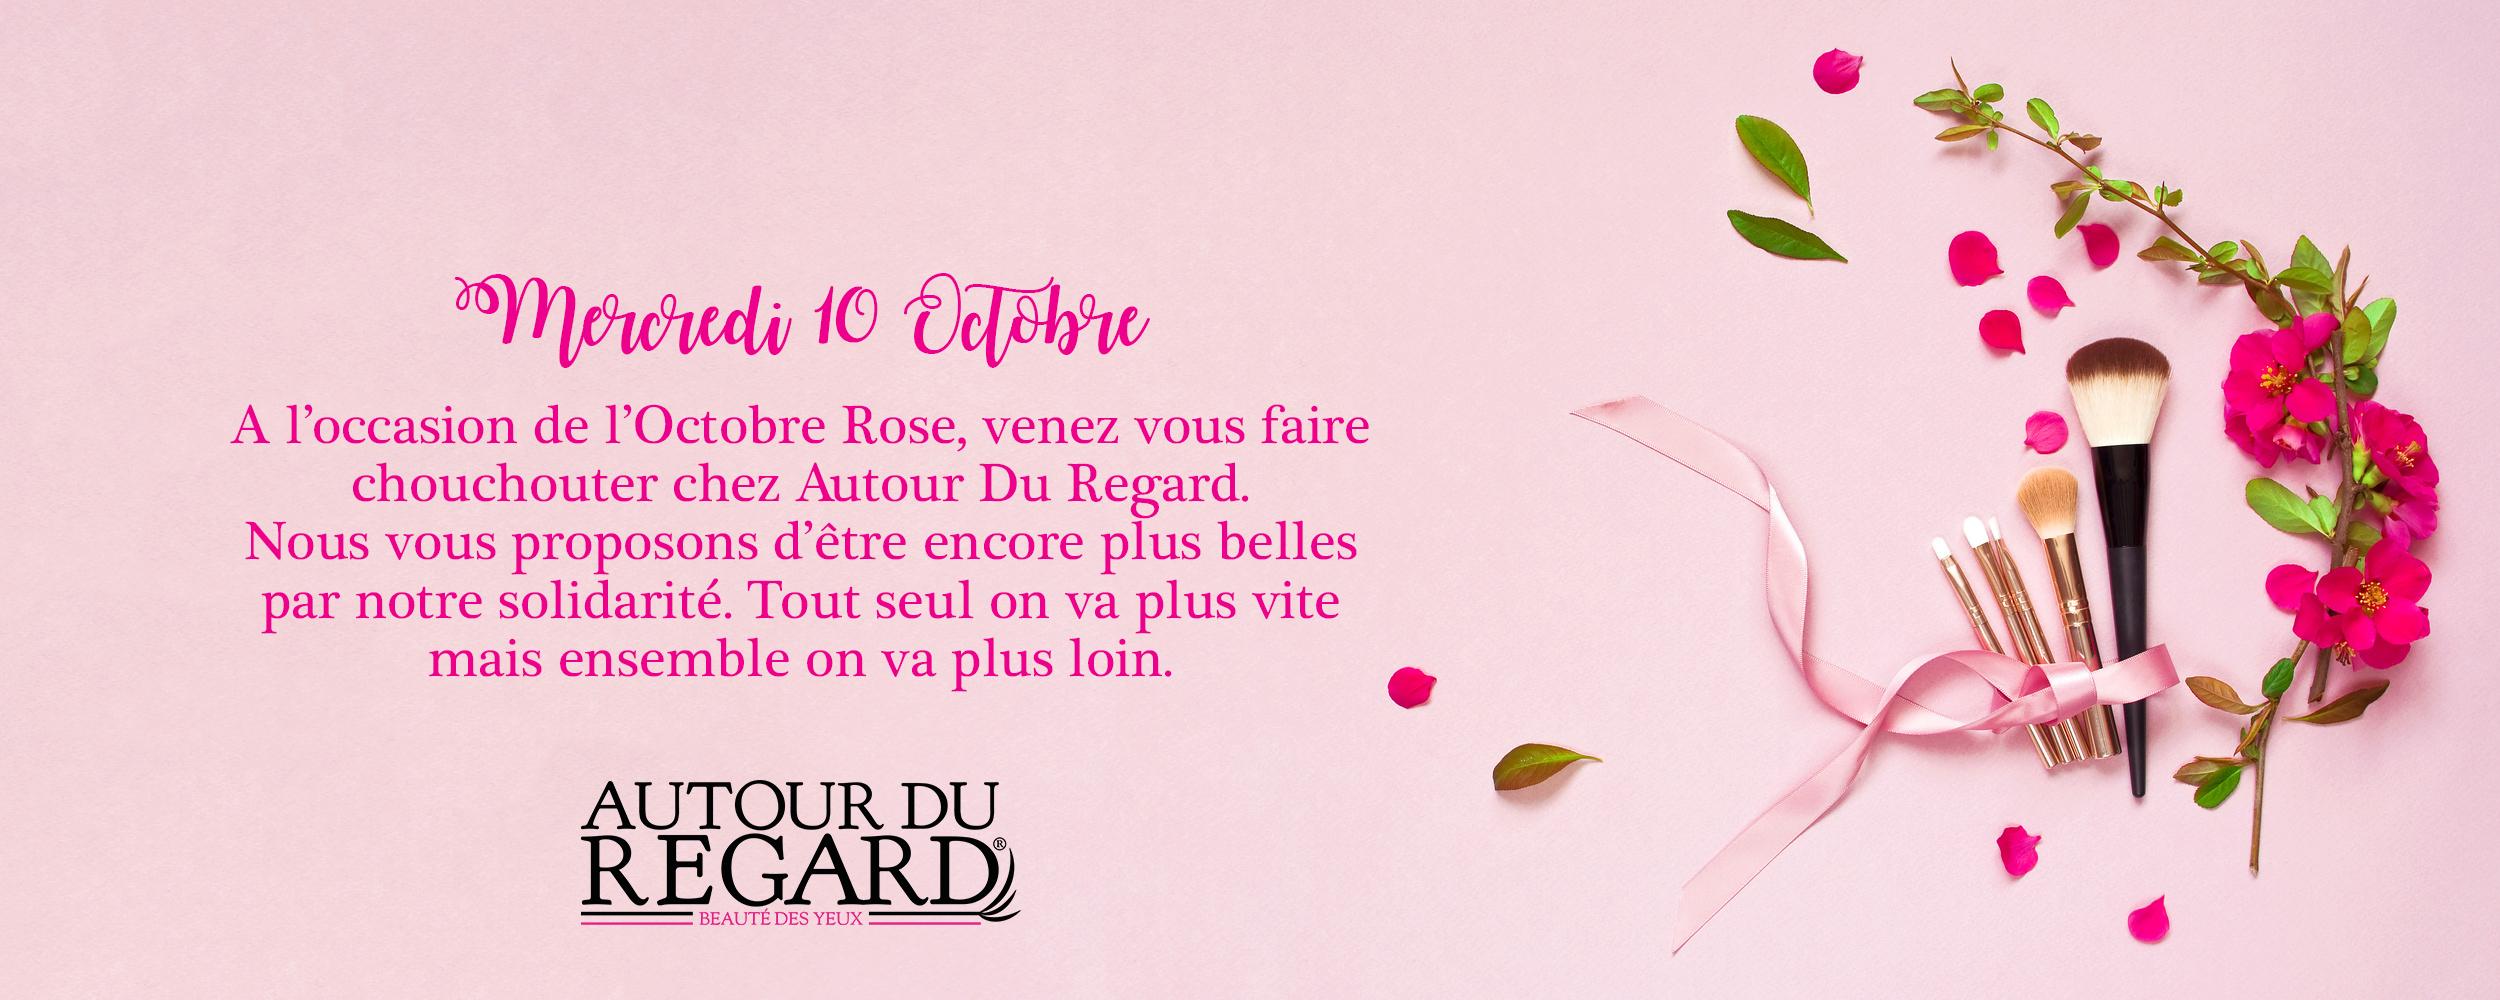 Bandeau-Octobre-Rose-CHL-ADR.jpg